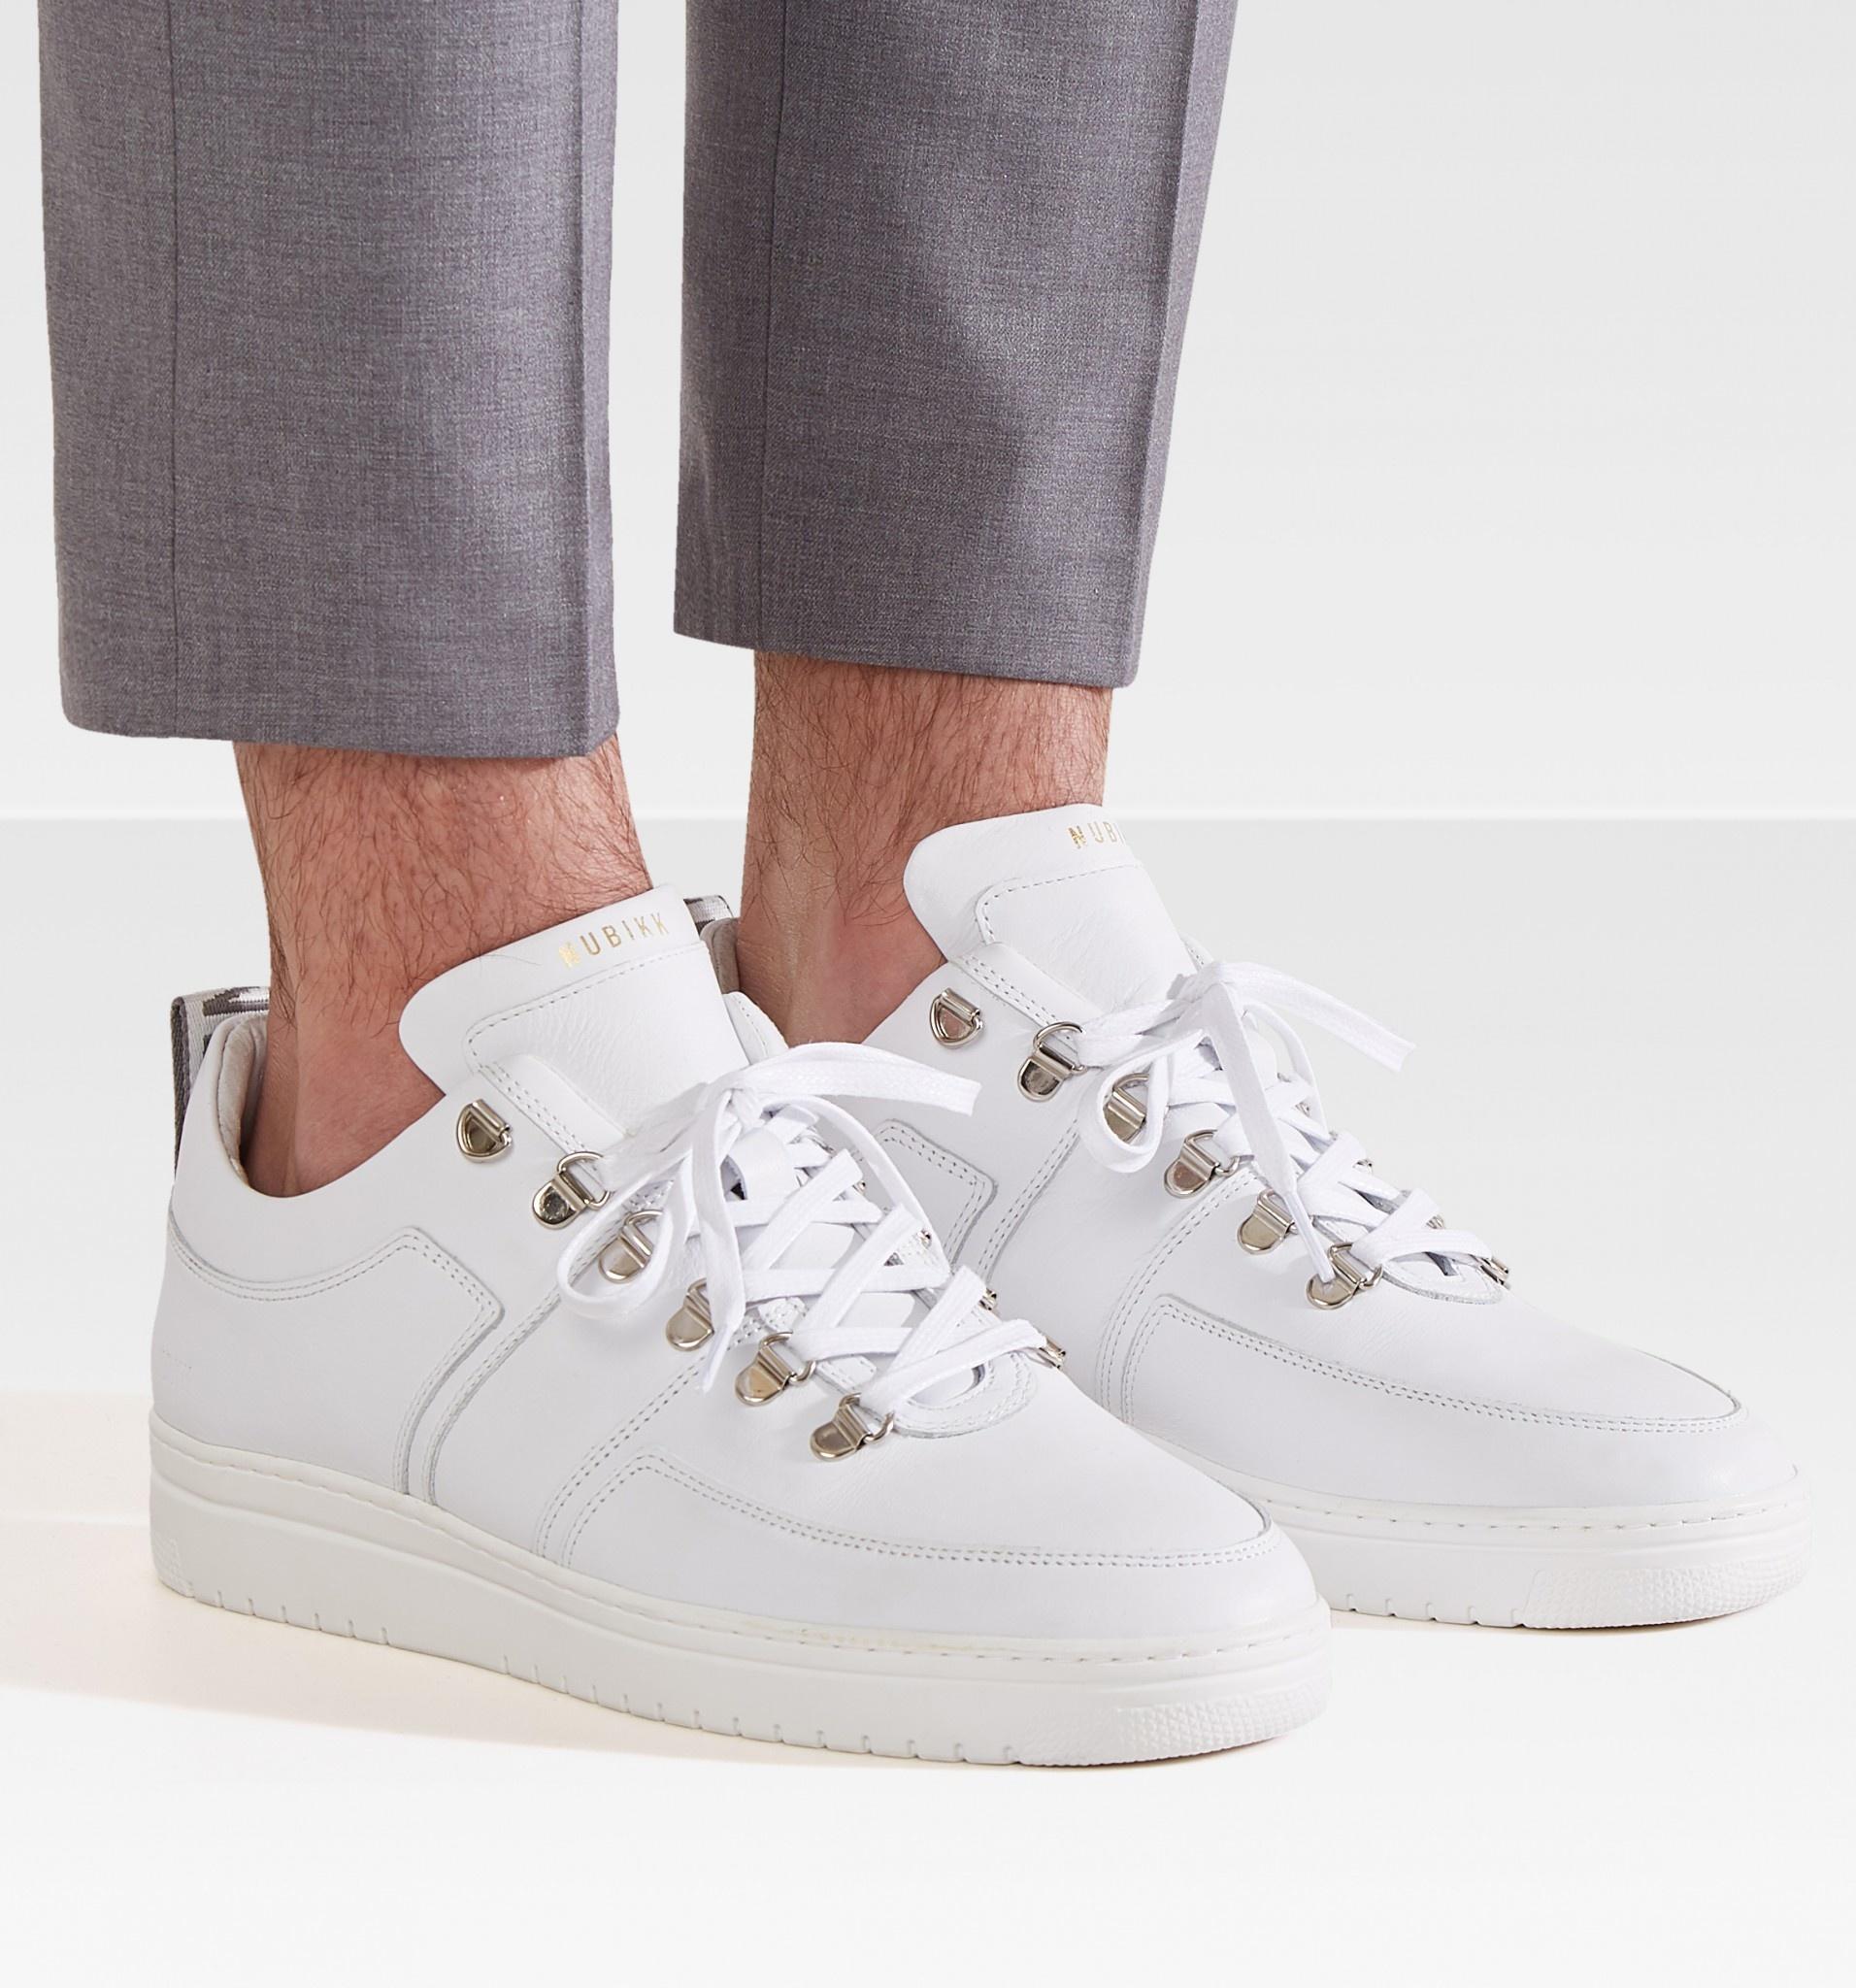 YEYE MAZE Leather White